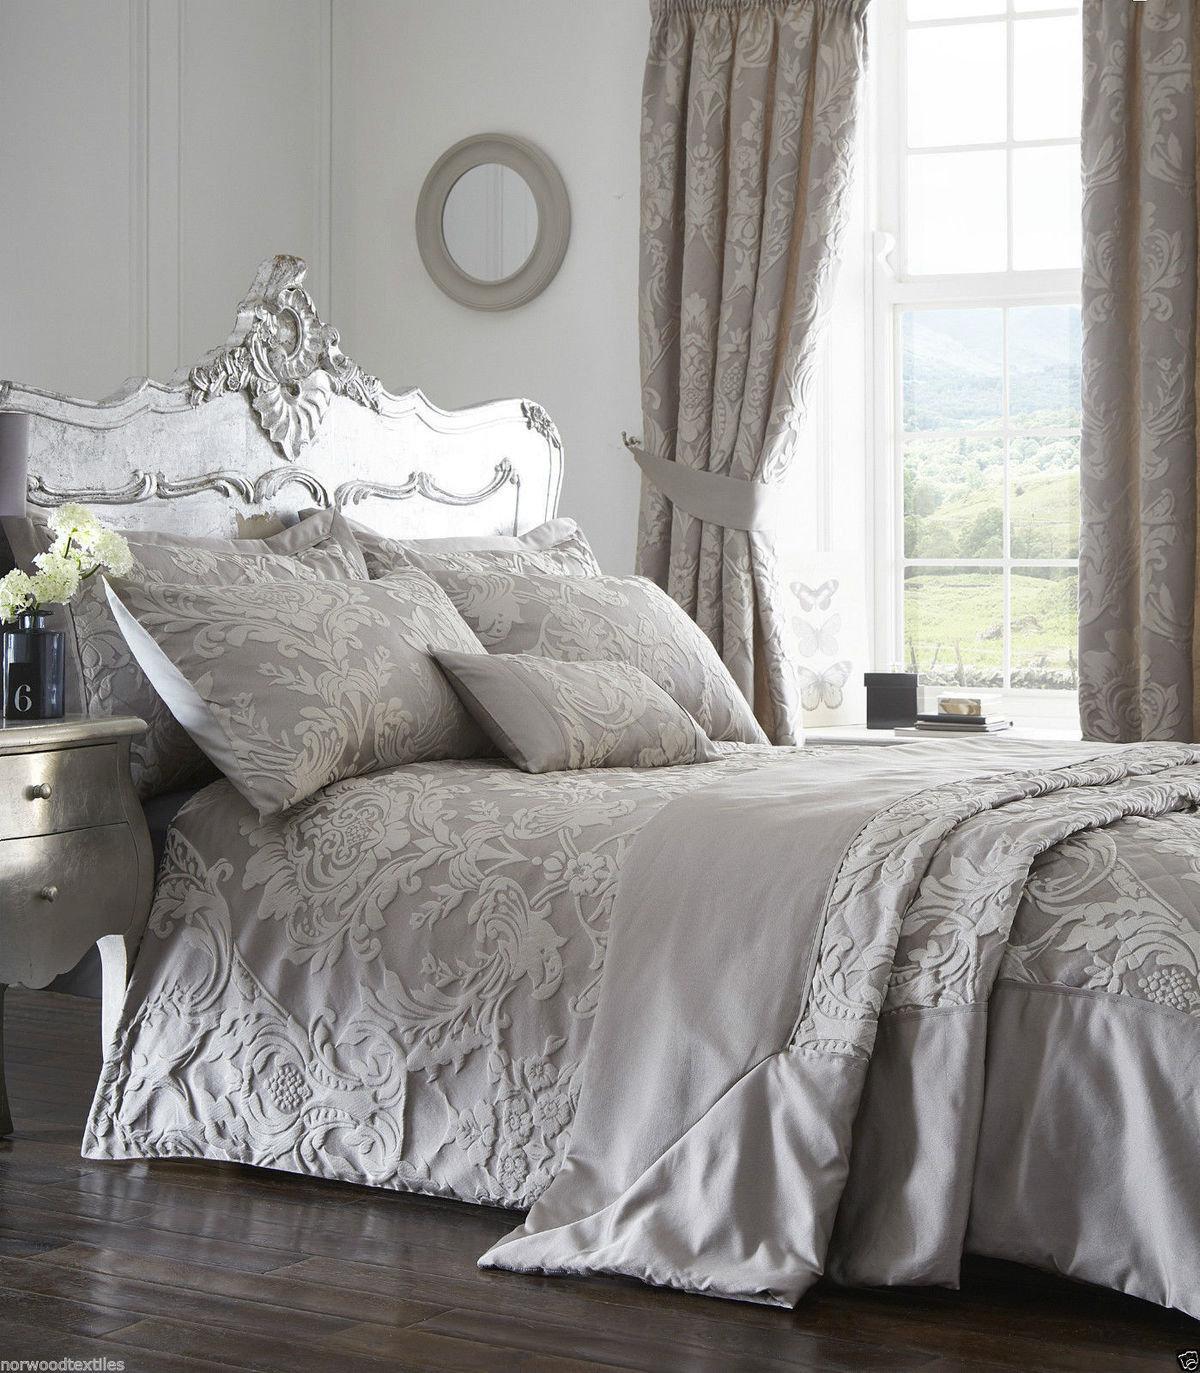 Buy Howard Traditional Jacquard Duvet Cover Set Bedding Range Online Norwood Textiles